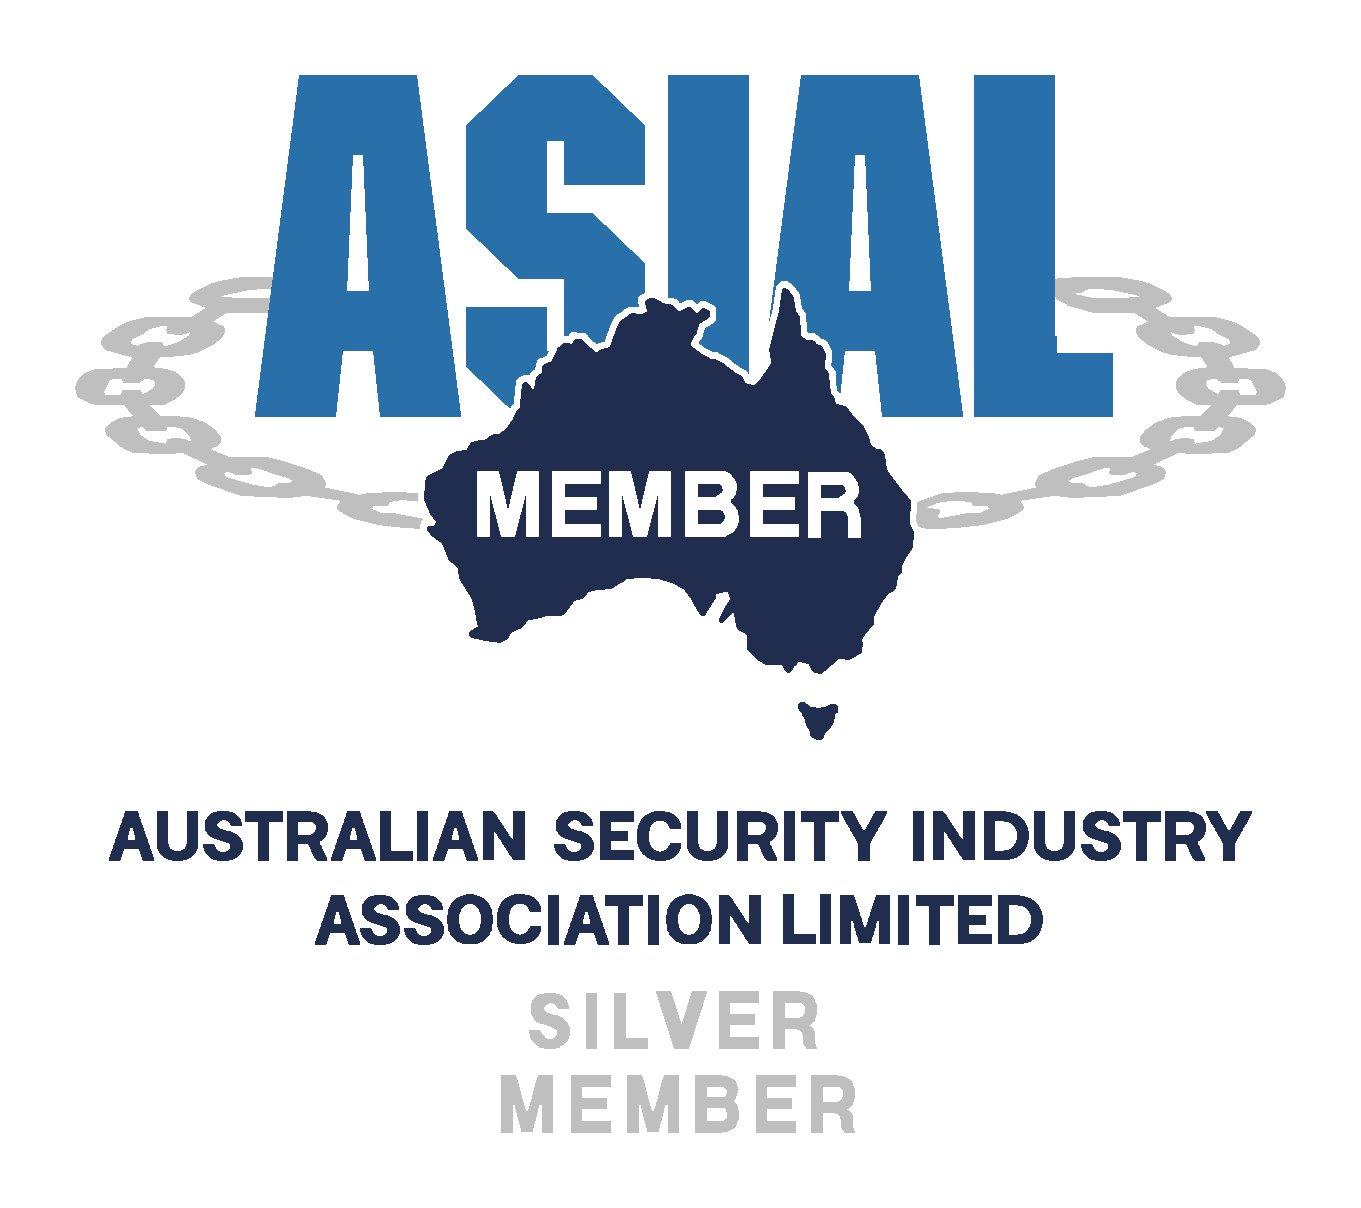 ASIAL silver membership logo